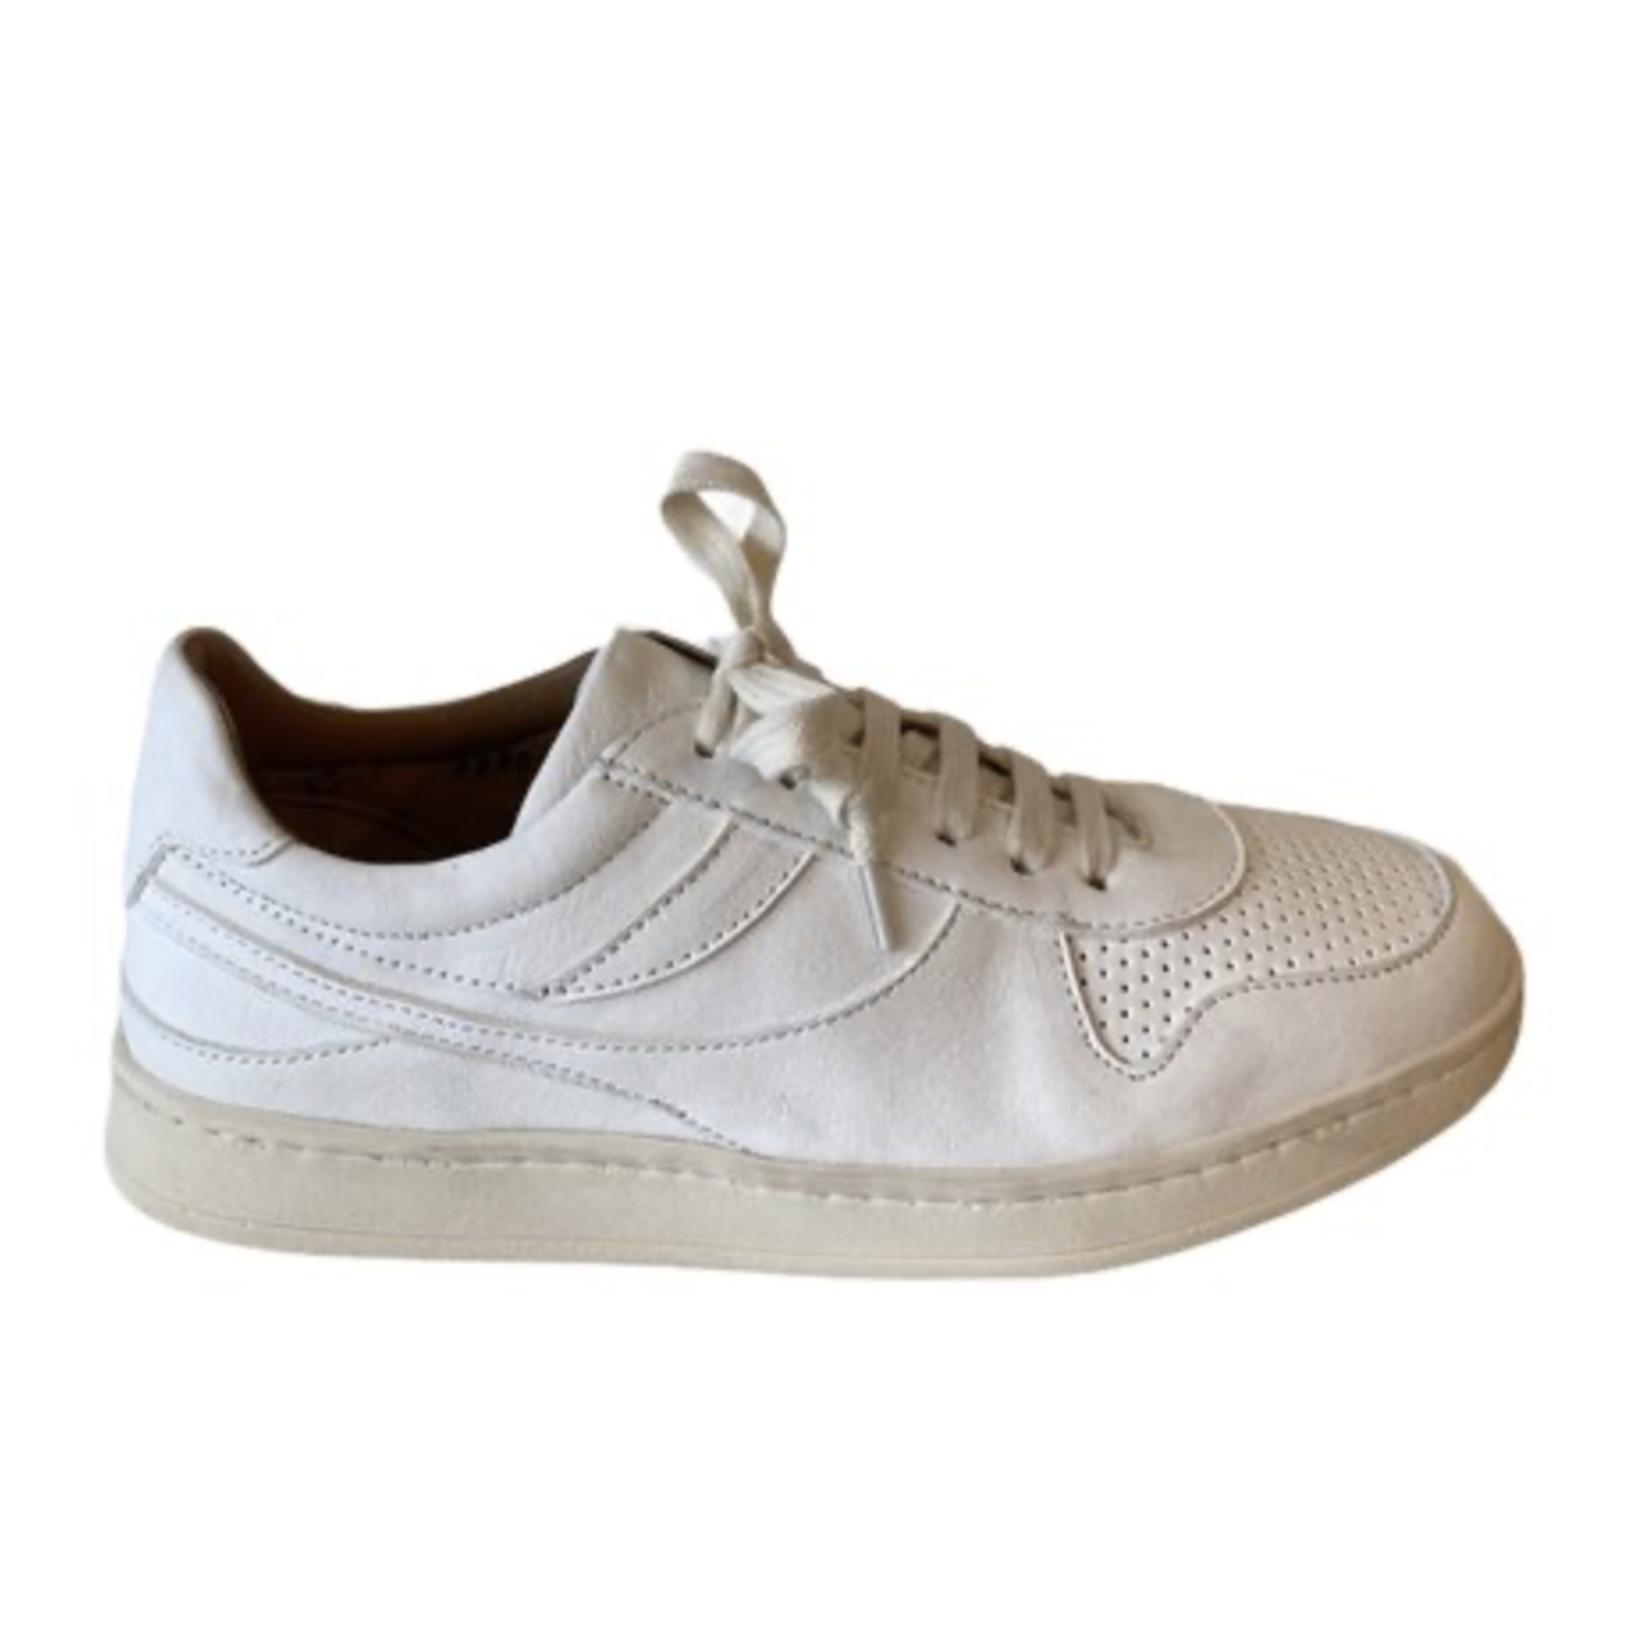 Elia Maurizi Elia Maurizi sneakers